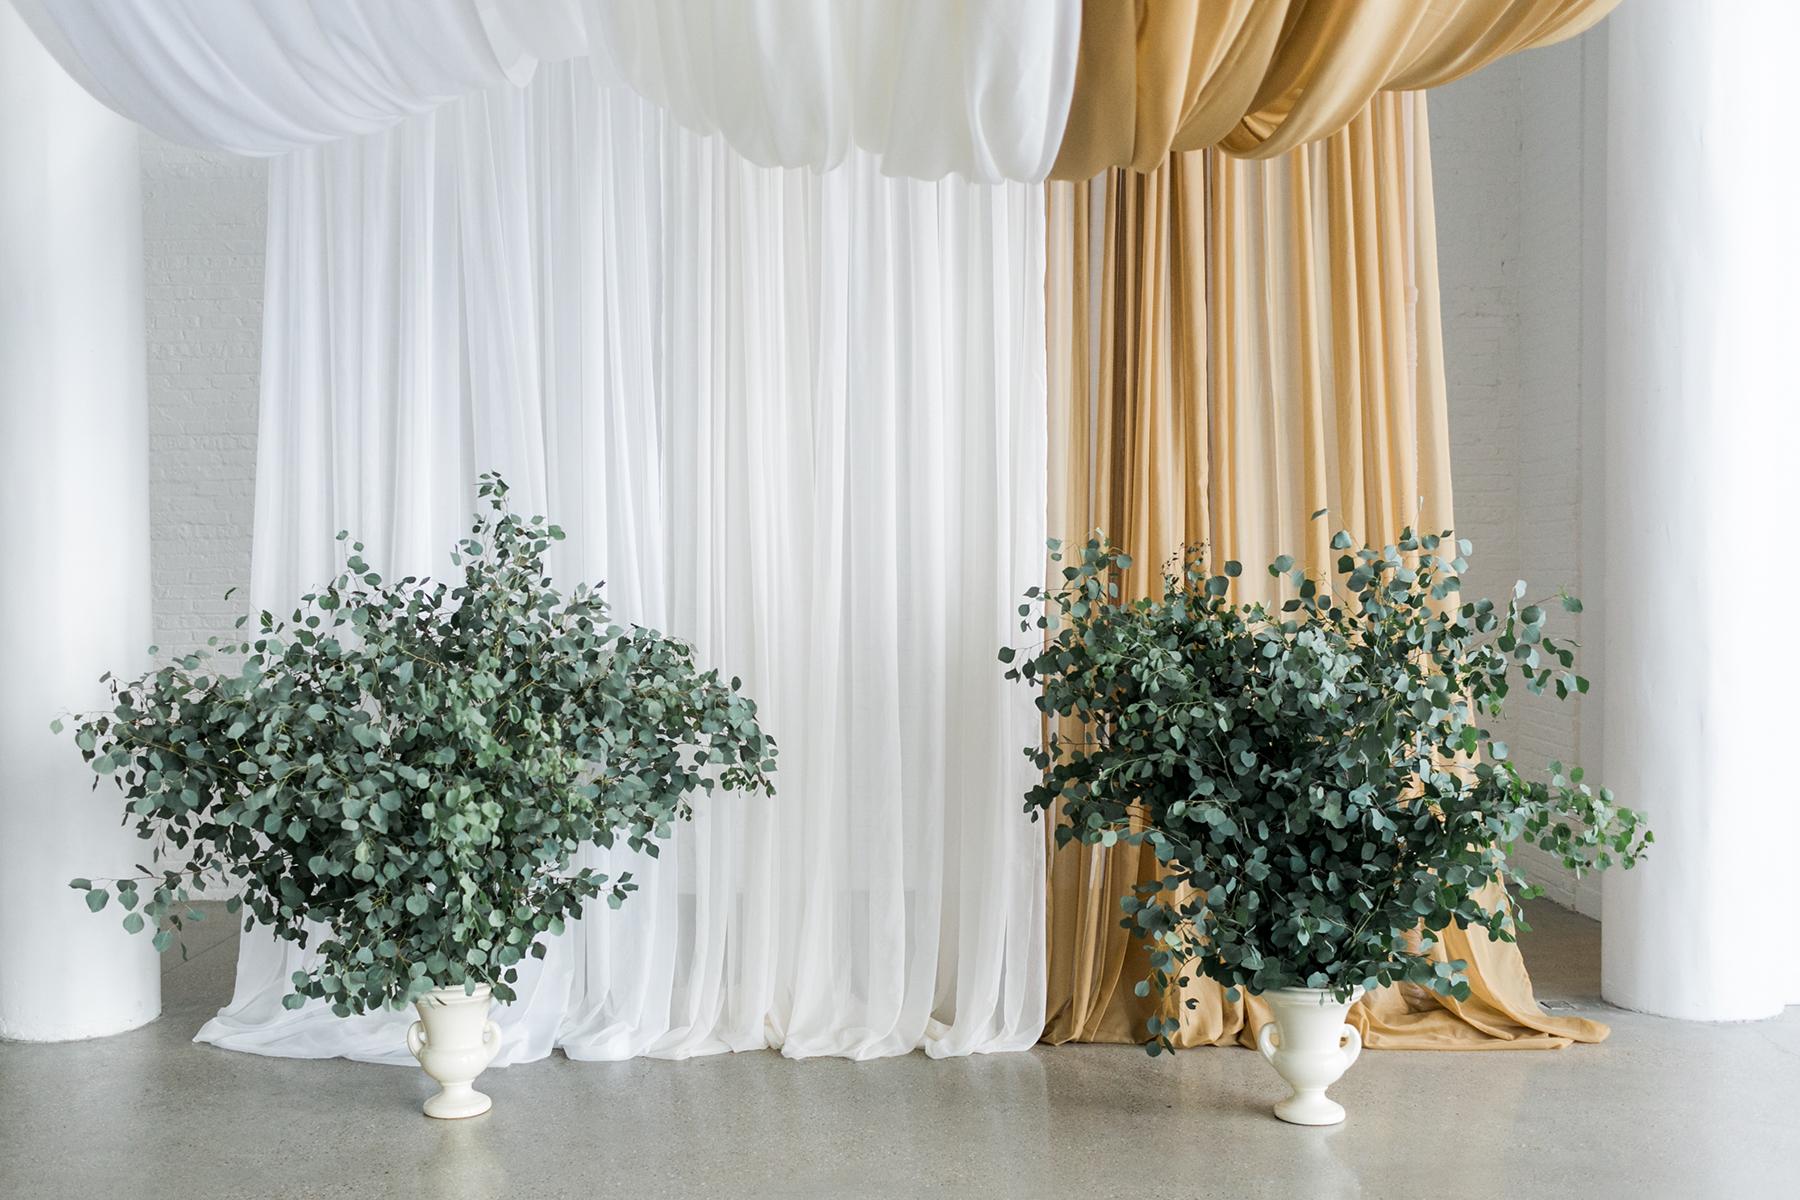 Enormous greenery urns for wedding altar elizabeth anne designs enormous greenery urns for wedding altar junglespirit Gallery